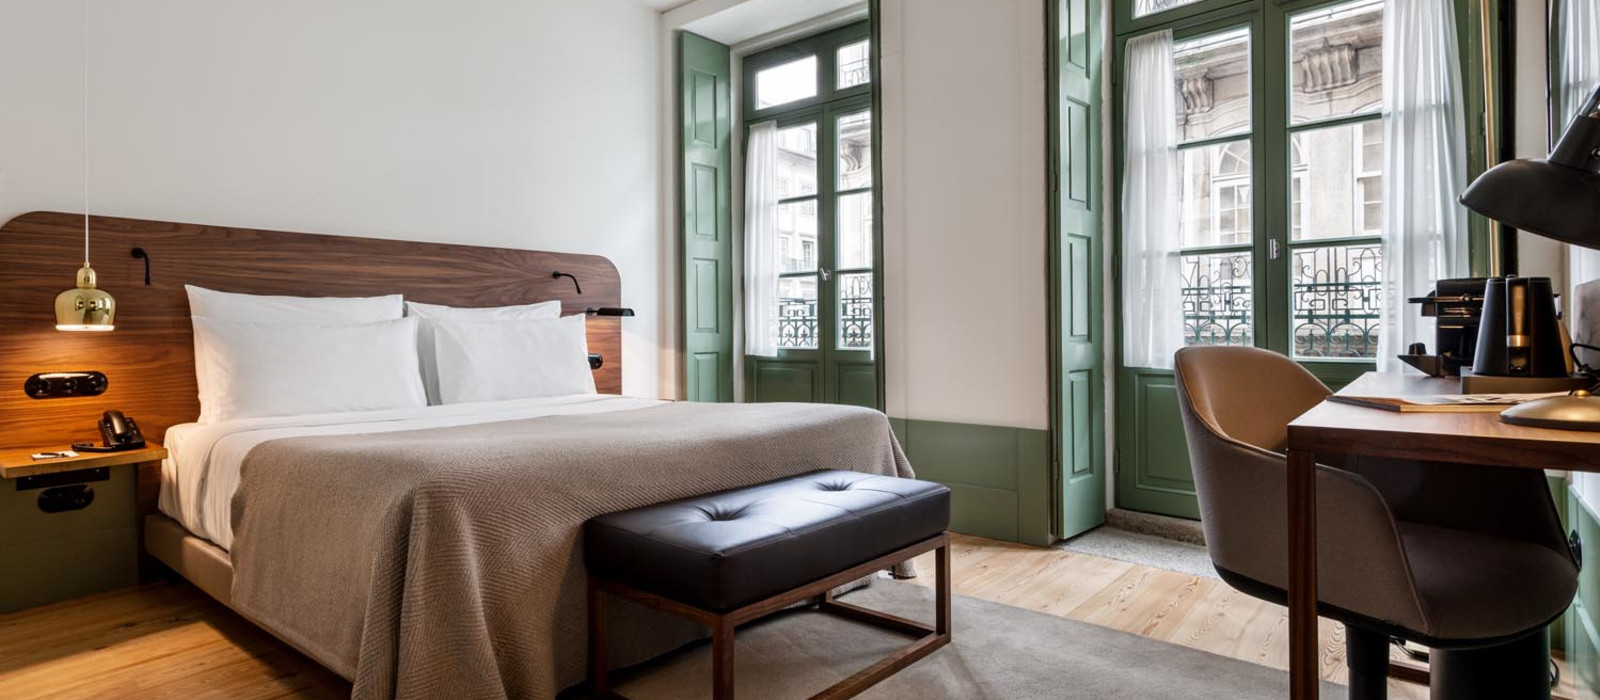 Hotel Pestana Porto: Goldsmith Portugal